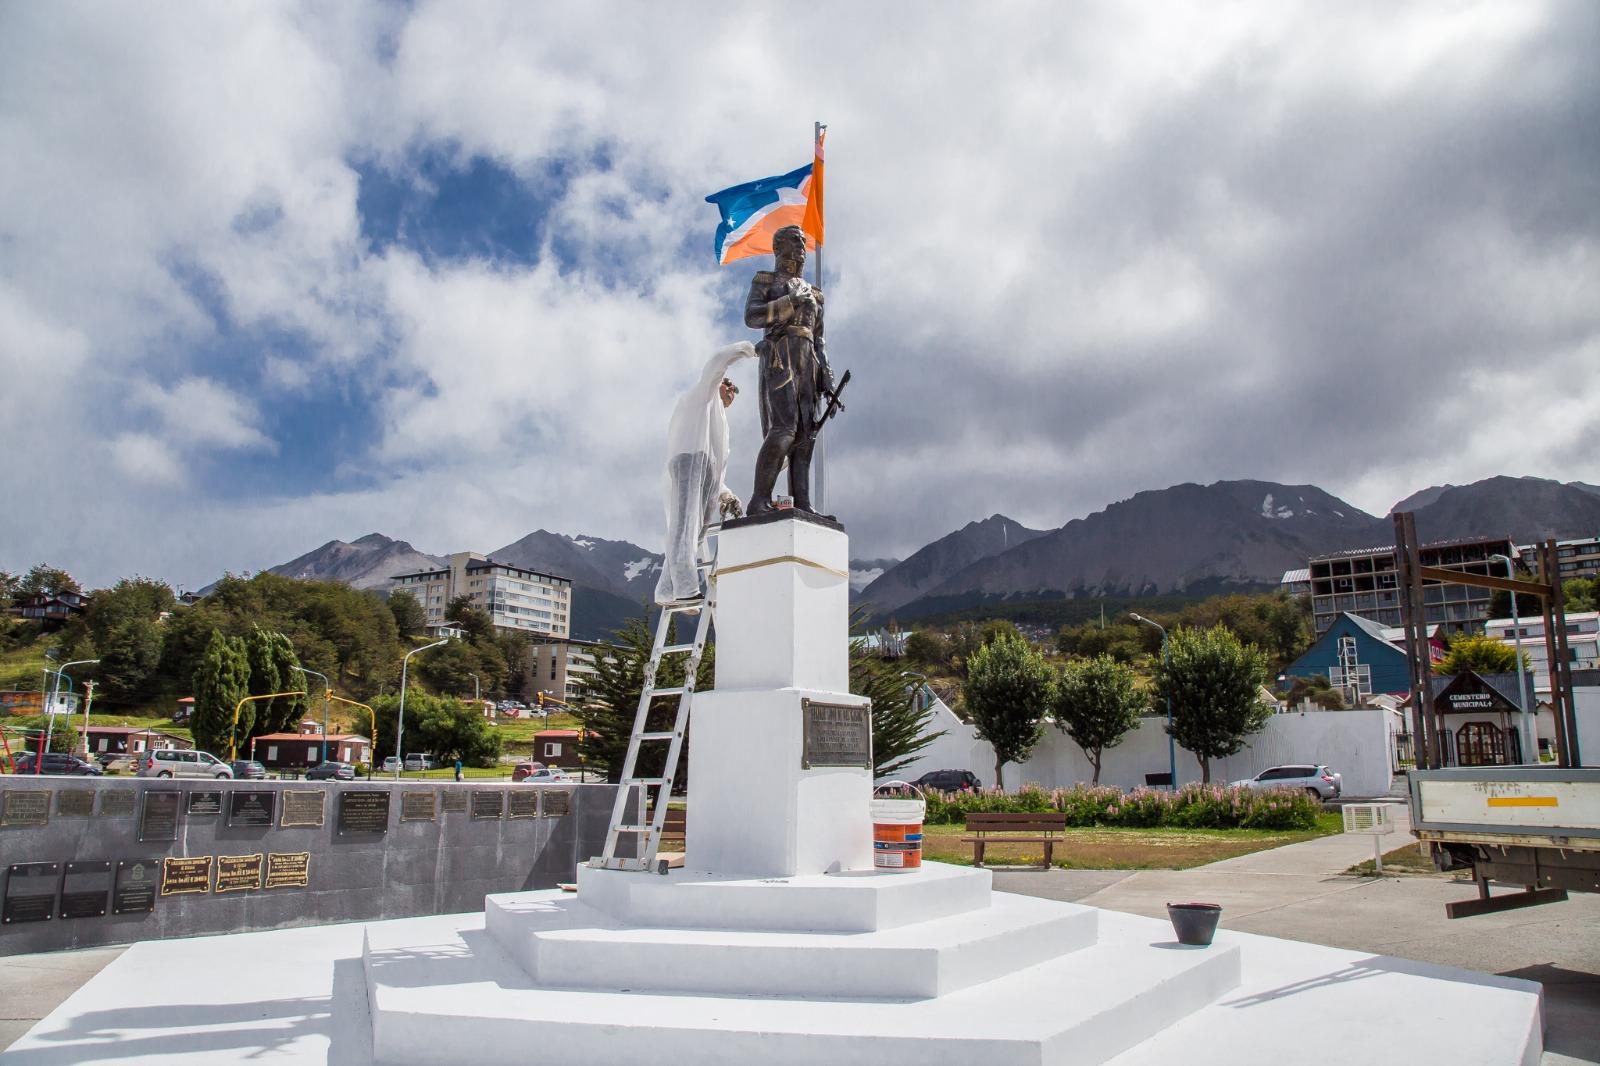 SE EMPLAZÓ LA NUEVA ESTATUA DEL GENERAL SAN MARTIN - La Licuadora